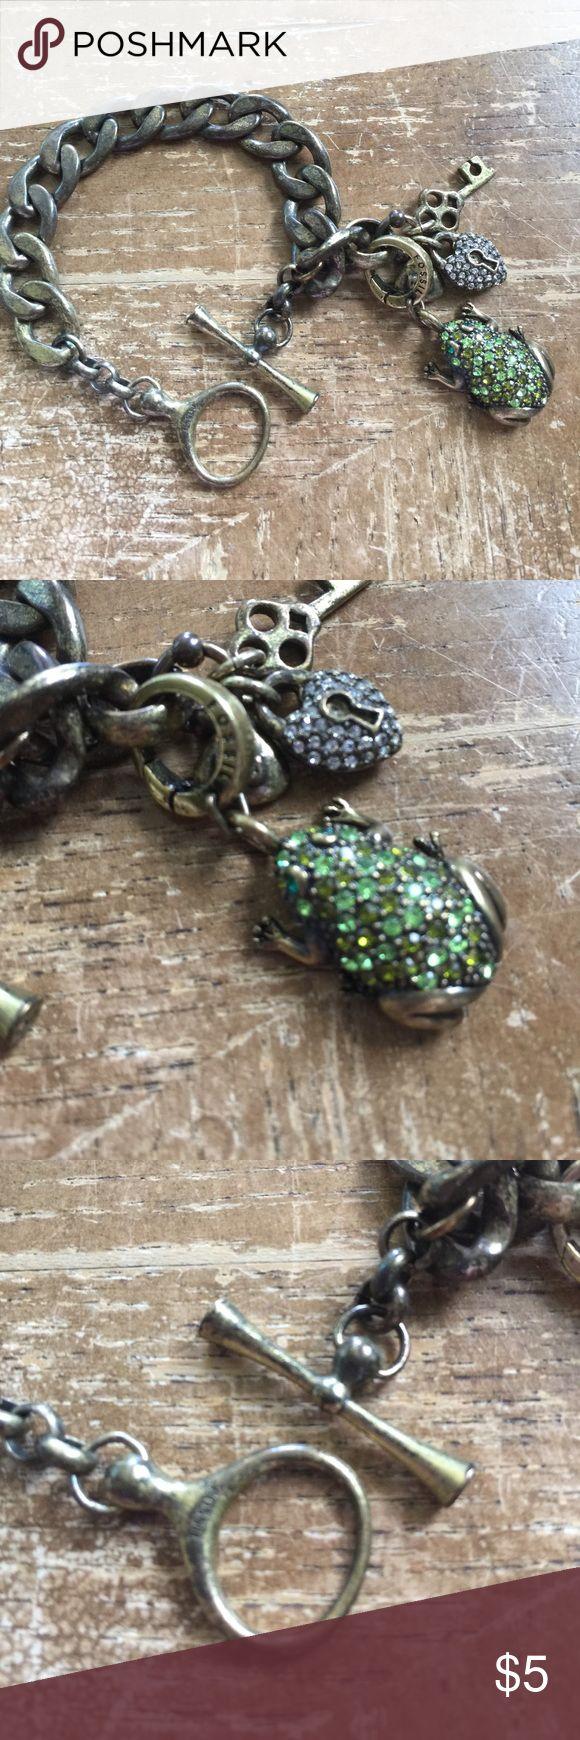 Bracelet Fossil Bracelet Fossil Fossil Jewelry Bracelets